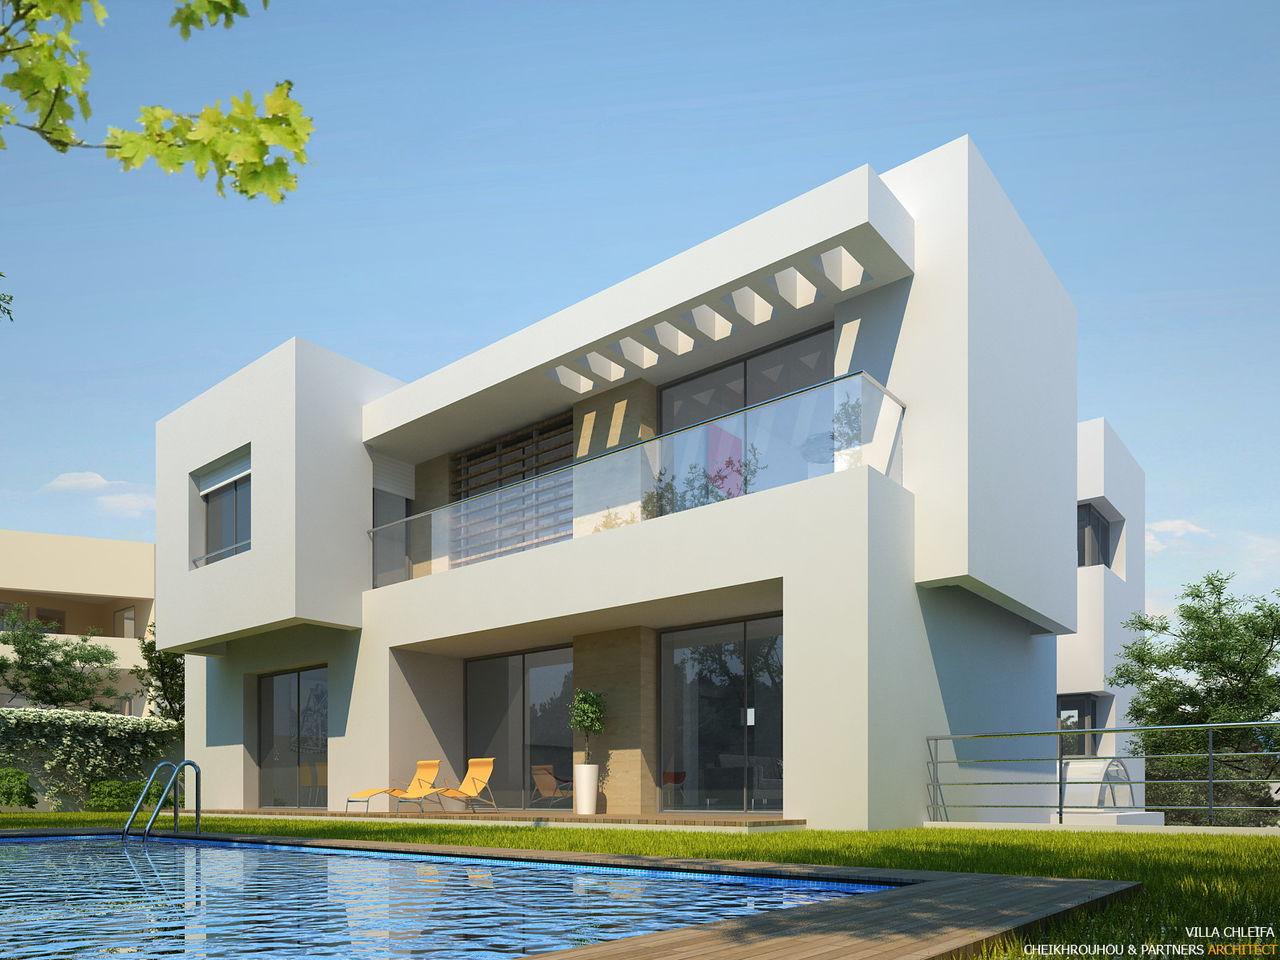 Cheikhrouhou & partners Architects VILLA C